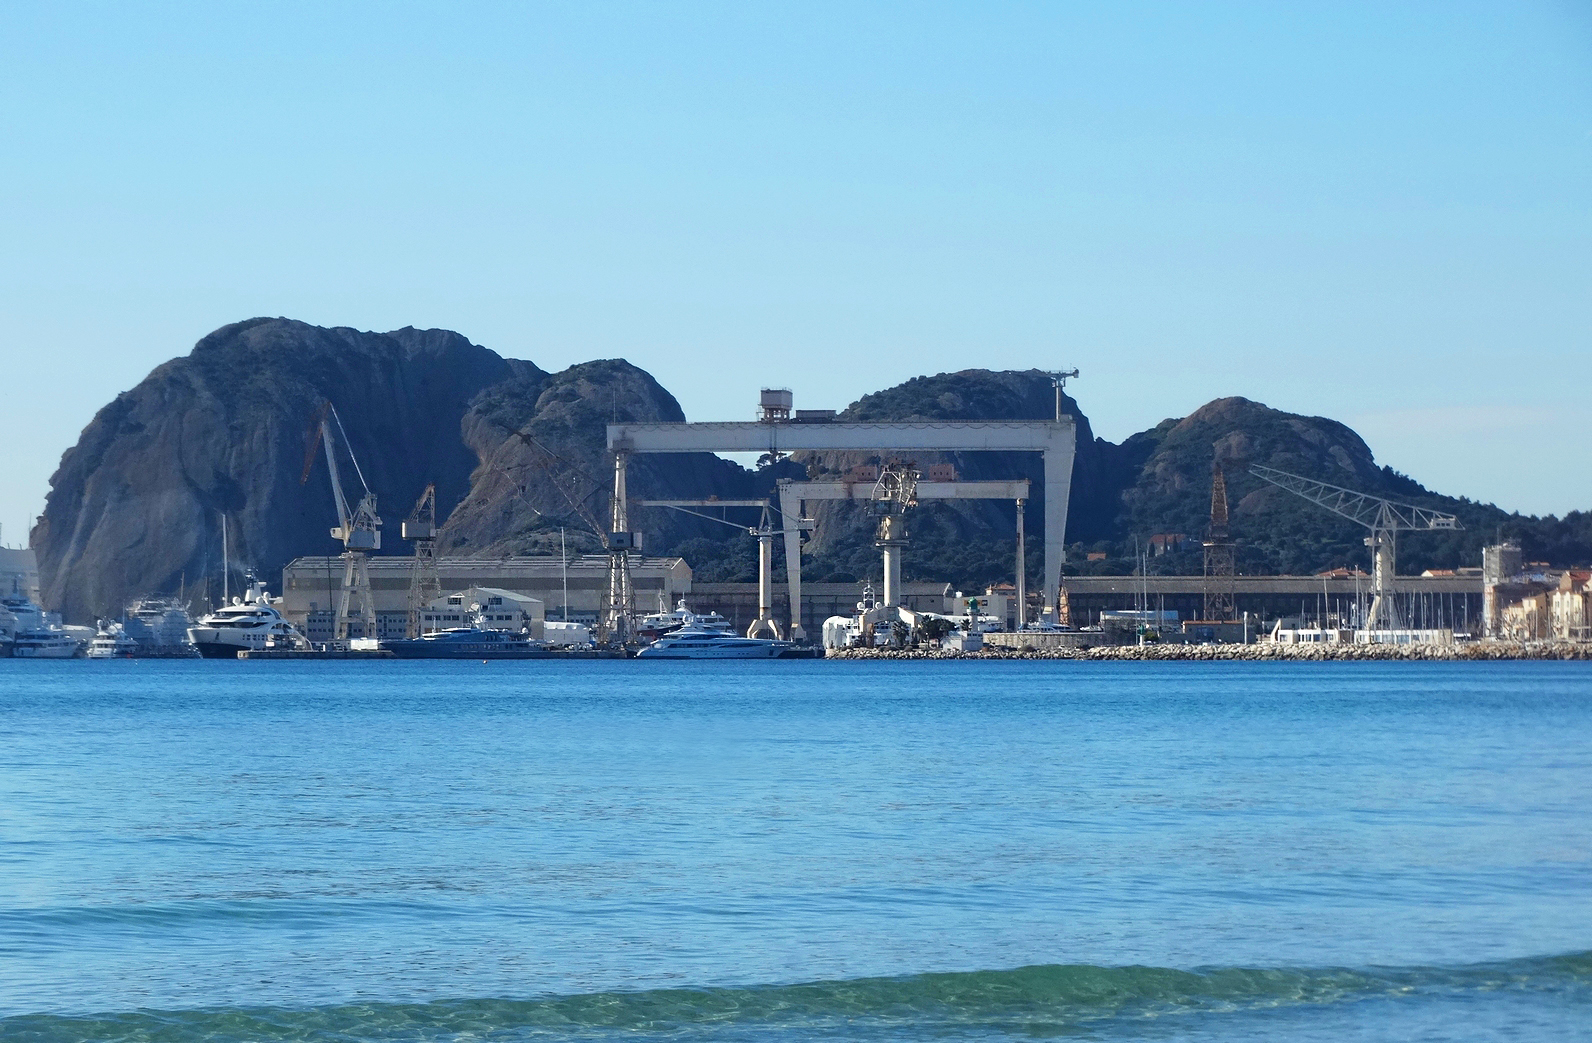 chantier naval la Ciotat